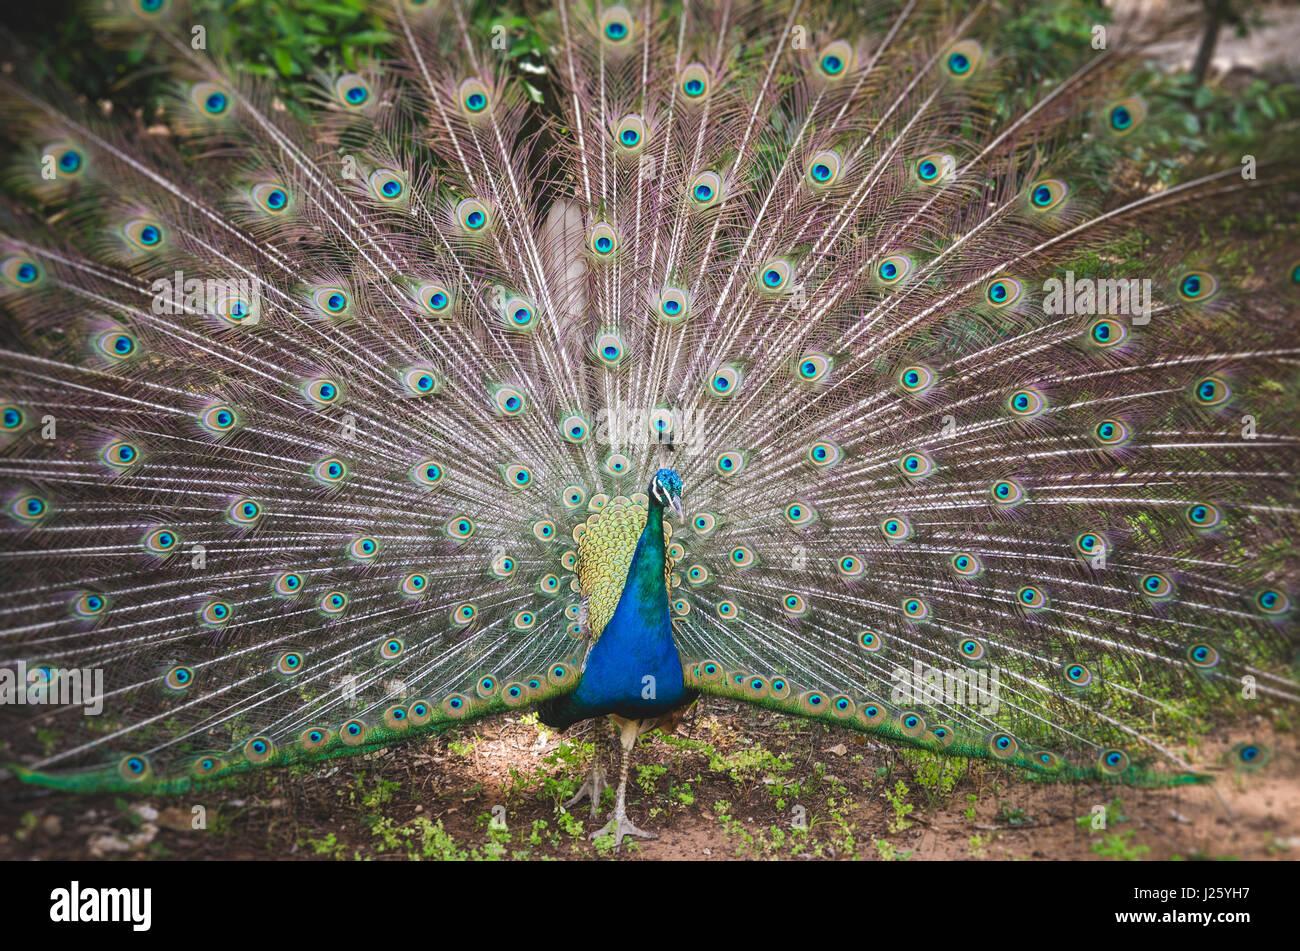 Peacock zeigt Schwanzfedern, Lokrum Botanischer Garten, Kroatien Stockbild